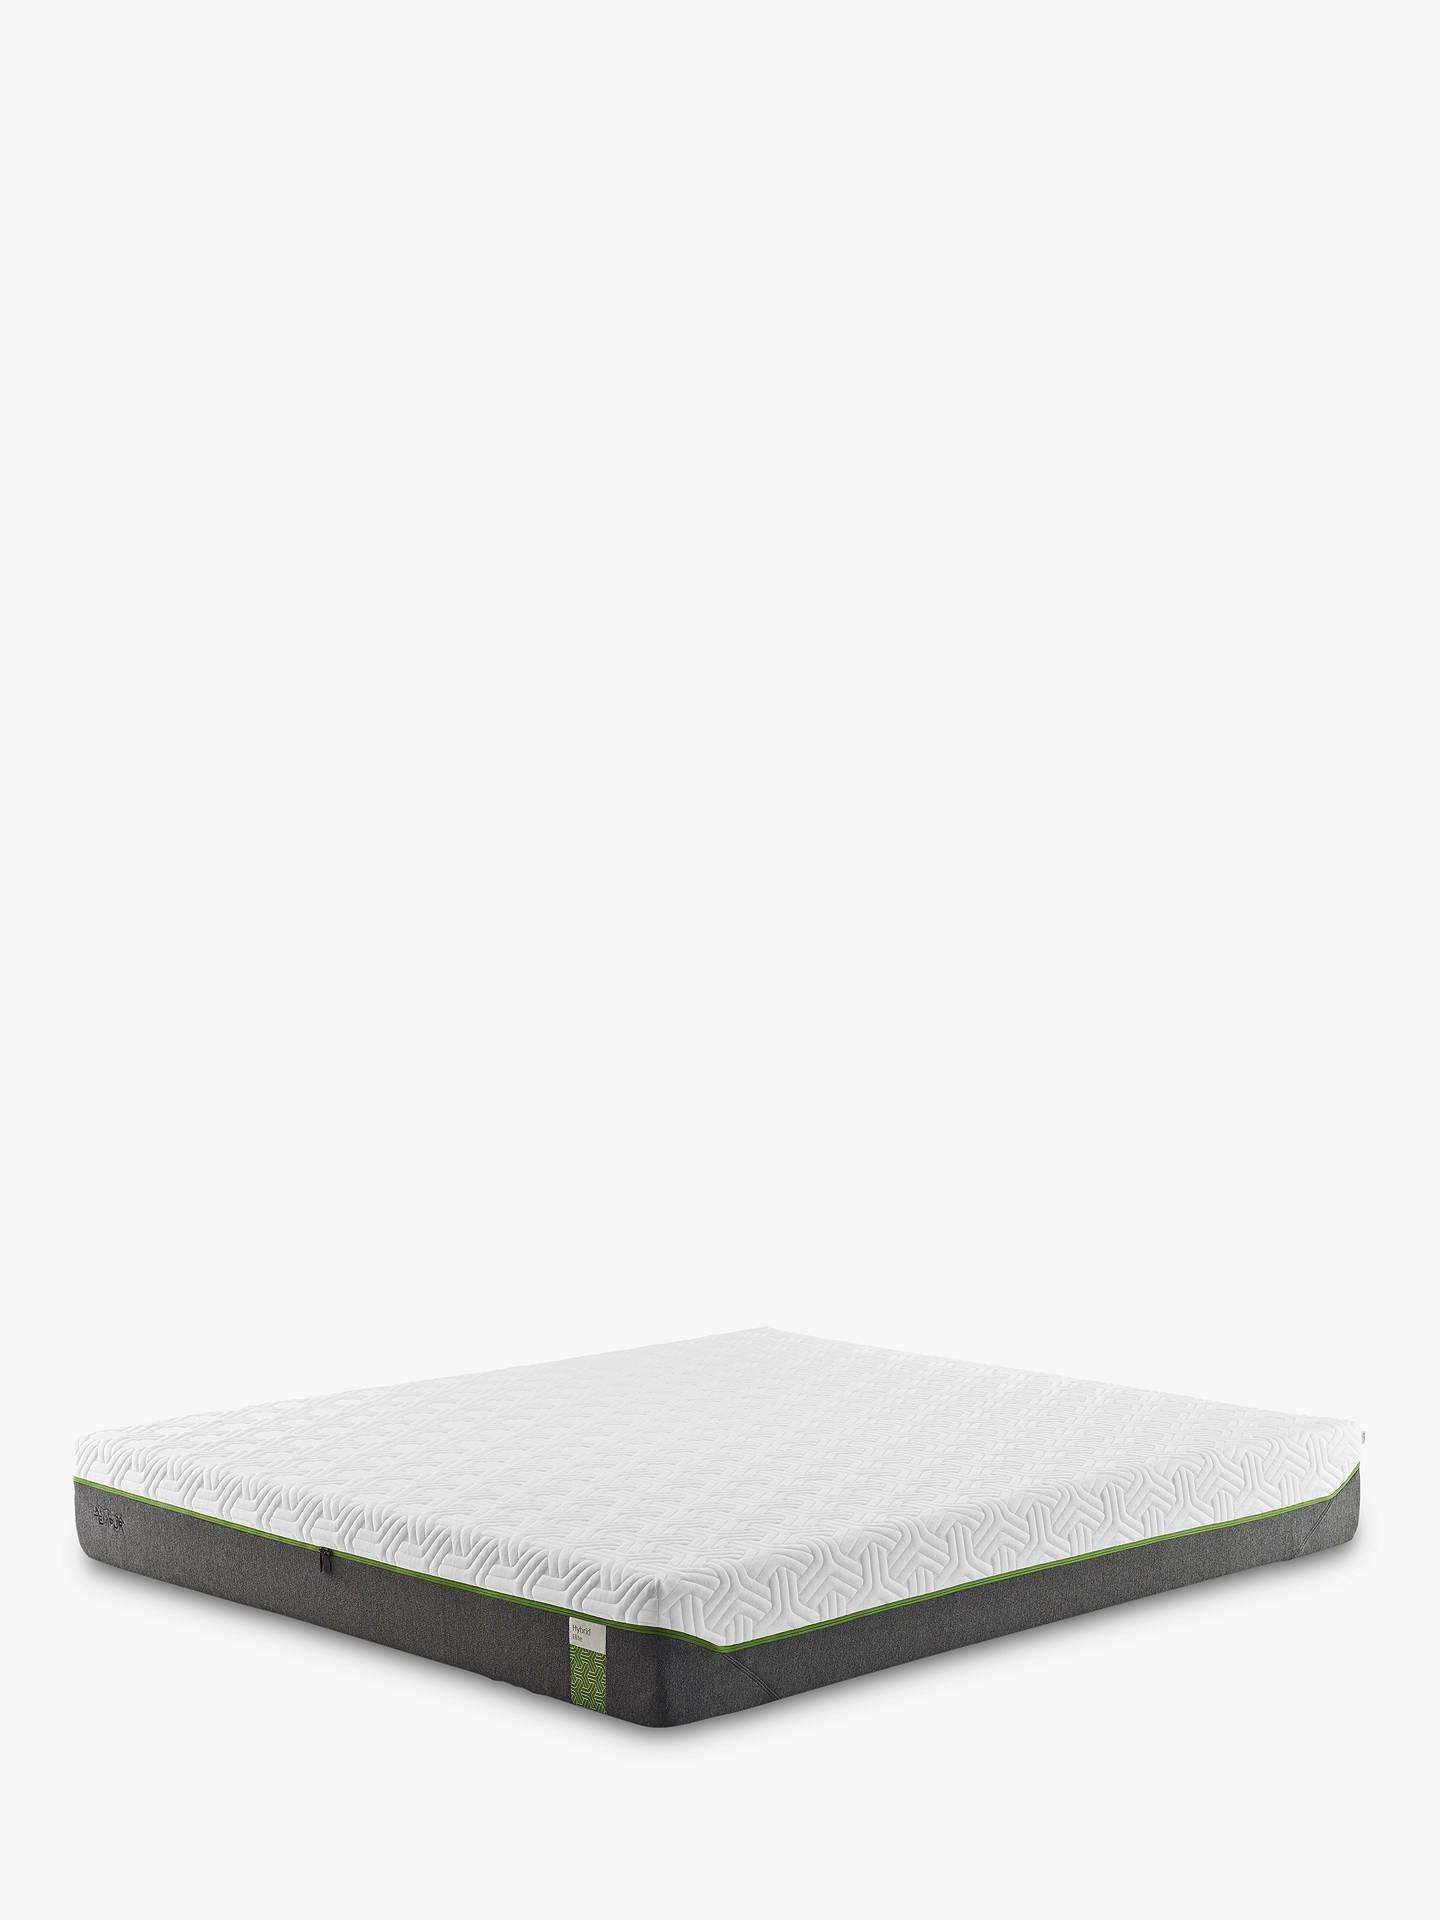 online retailer 37e66 72bcd Tempur Hybrid Elite 25 Pocket Spring Memory Foam Mattress, Medium, King Size